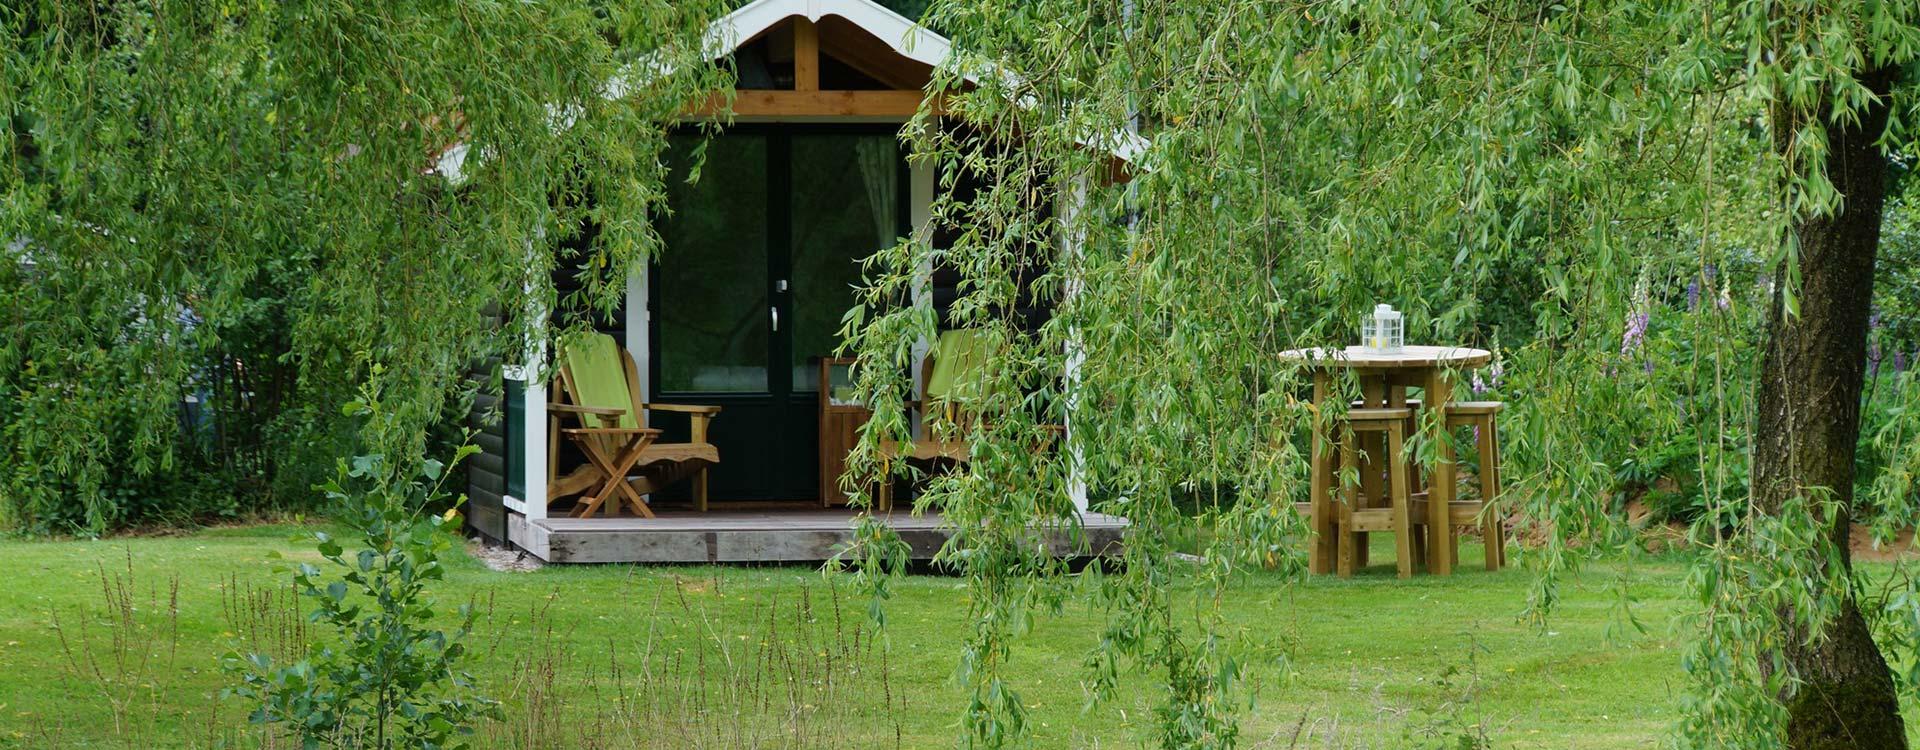 camping-meistershof-trekkerhut-huren-in-dwingeloo